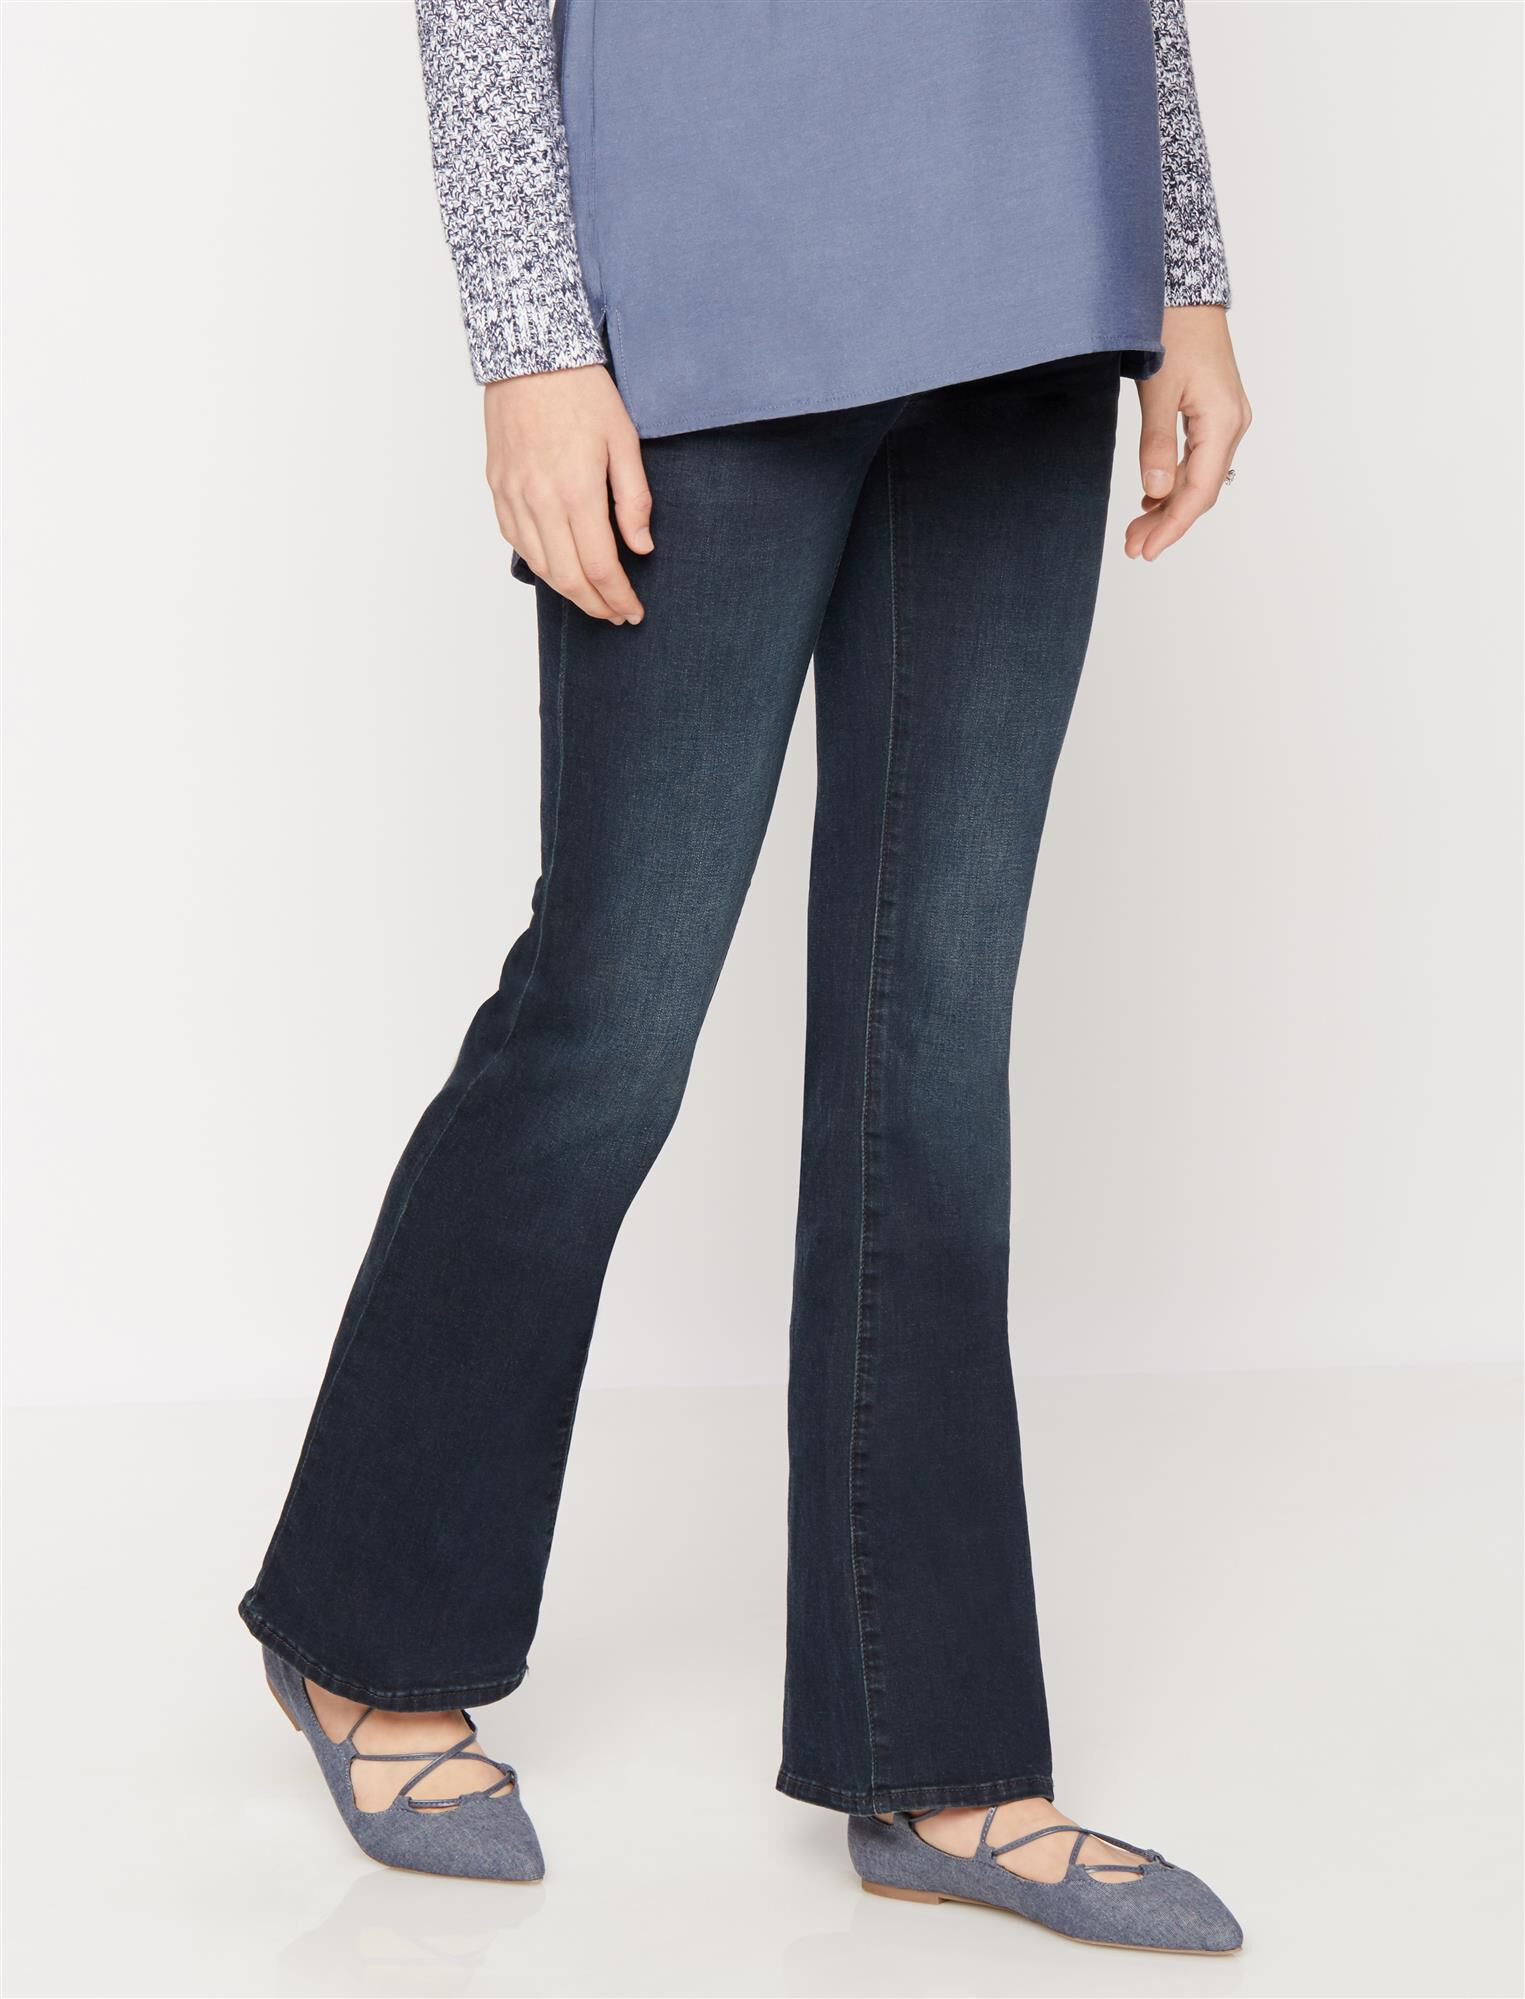 Luxe Essentials Denim Secret Fit Belly Boot Cut Maternity Jeans